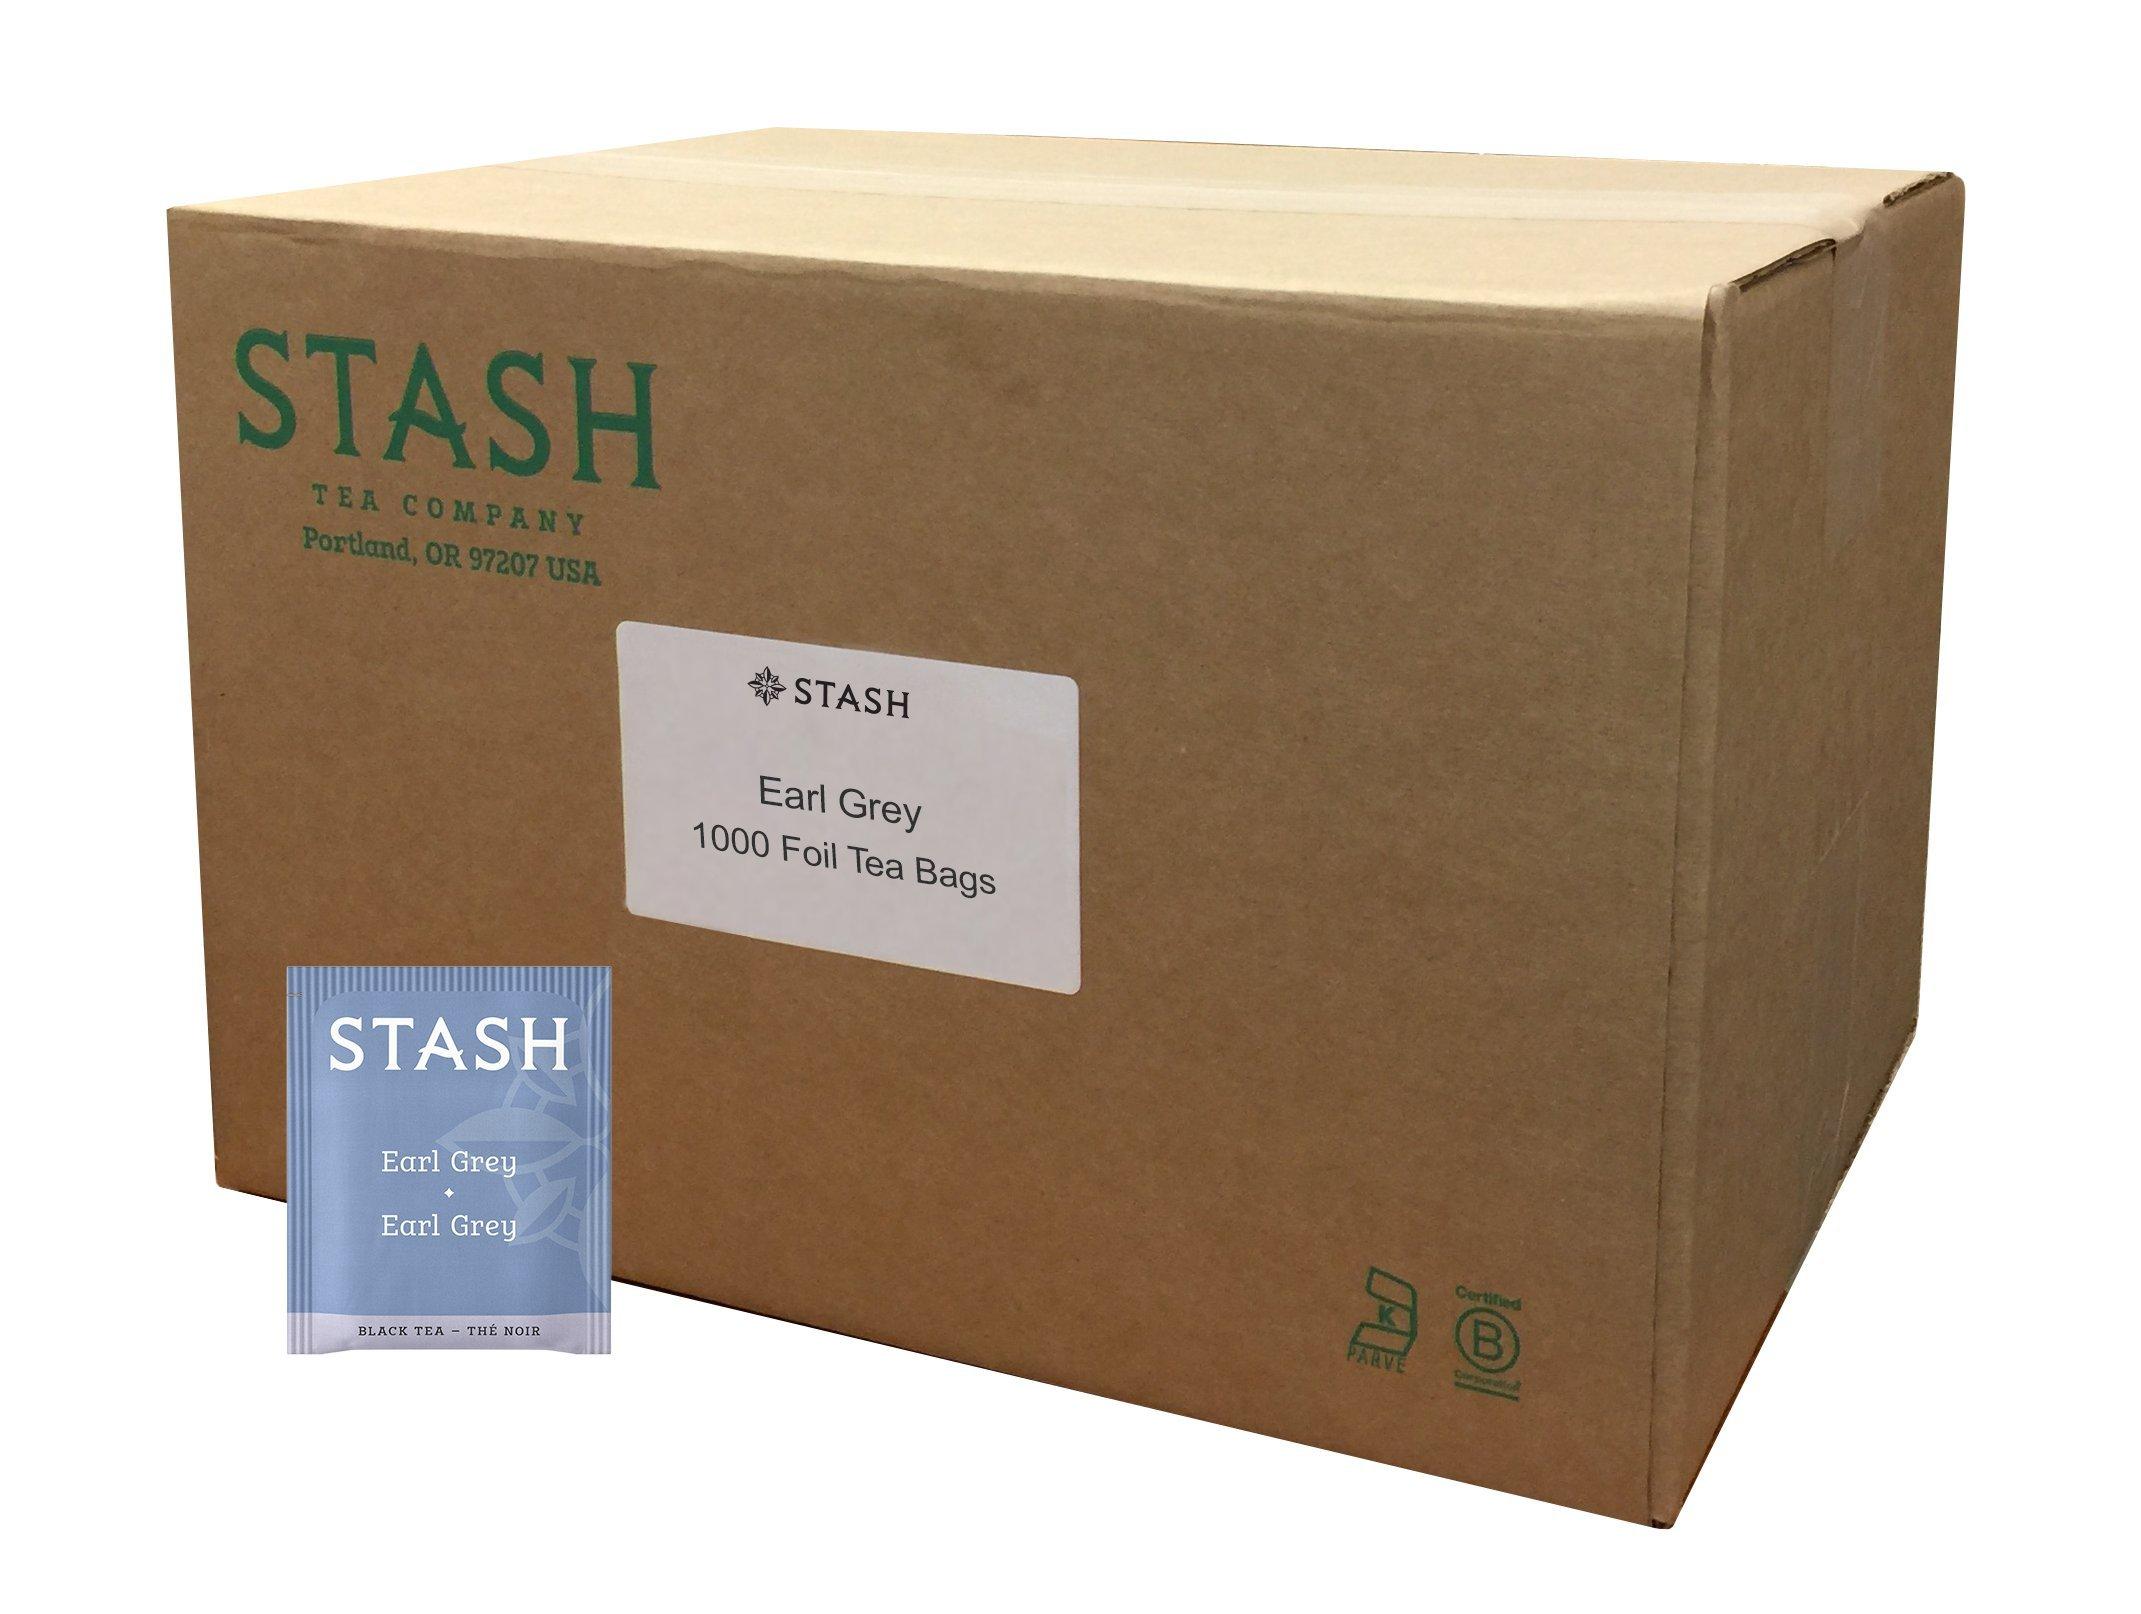 Stash Tea Earl Grey Black Tea, 1000 Count Tea Bags in Foil Full Caffeine Tea, Black Tea with Bergamot, Enjoy Hot or Iced